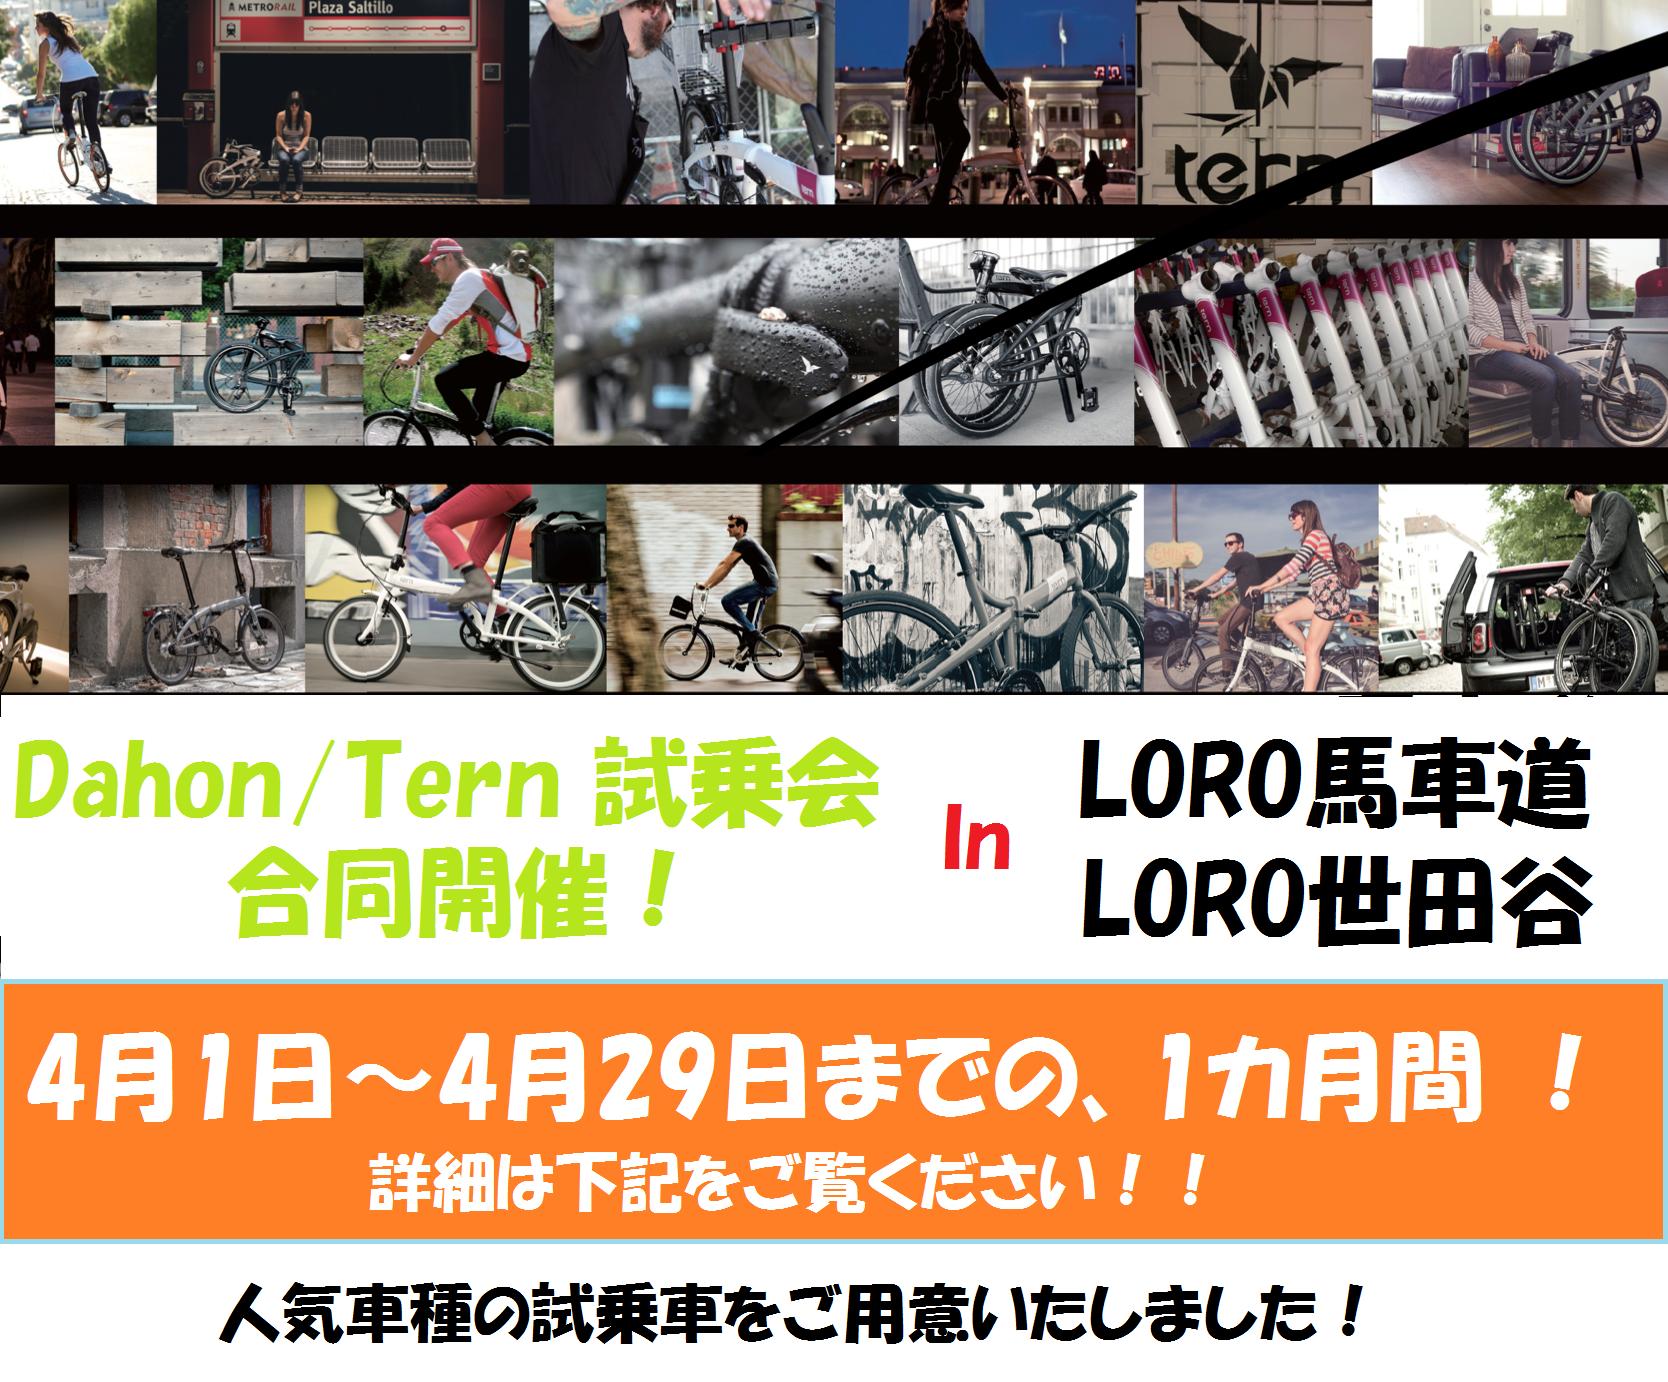 sukurinsiyotuto-2013-12-16-171020ぃg.png